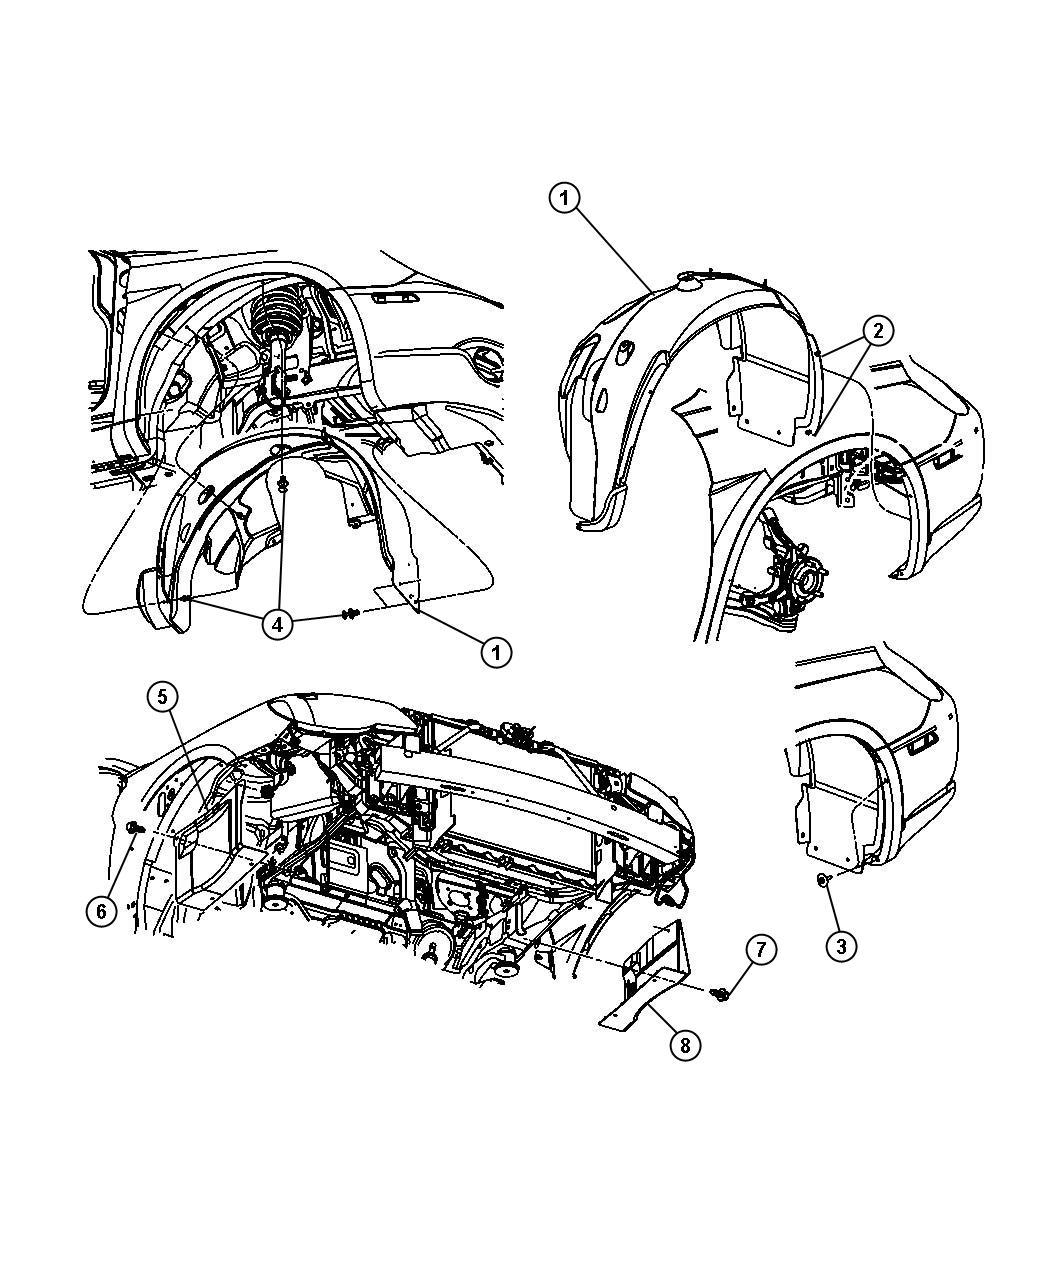 2013 Chrysler 200 Convertible Limited 3.6L V6 Shield